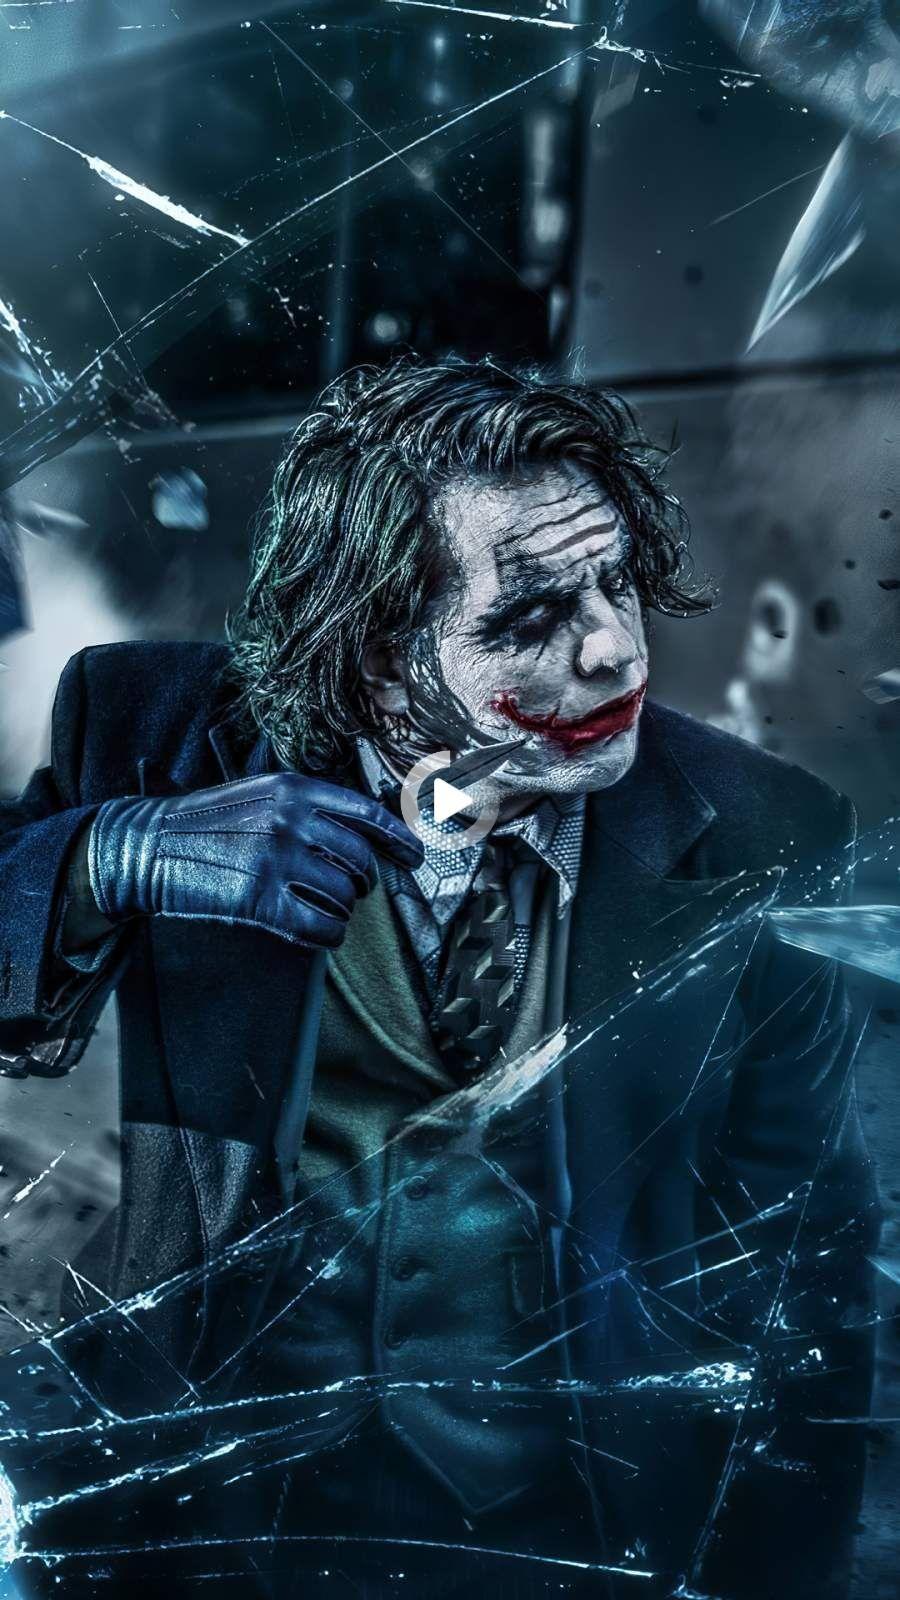 Inspiring Phone Wallpapers 3 In 2021 Joker Hd Wallpaper Batman Wallpaper Joker Wallpapers